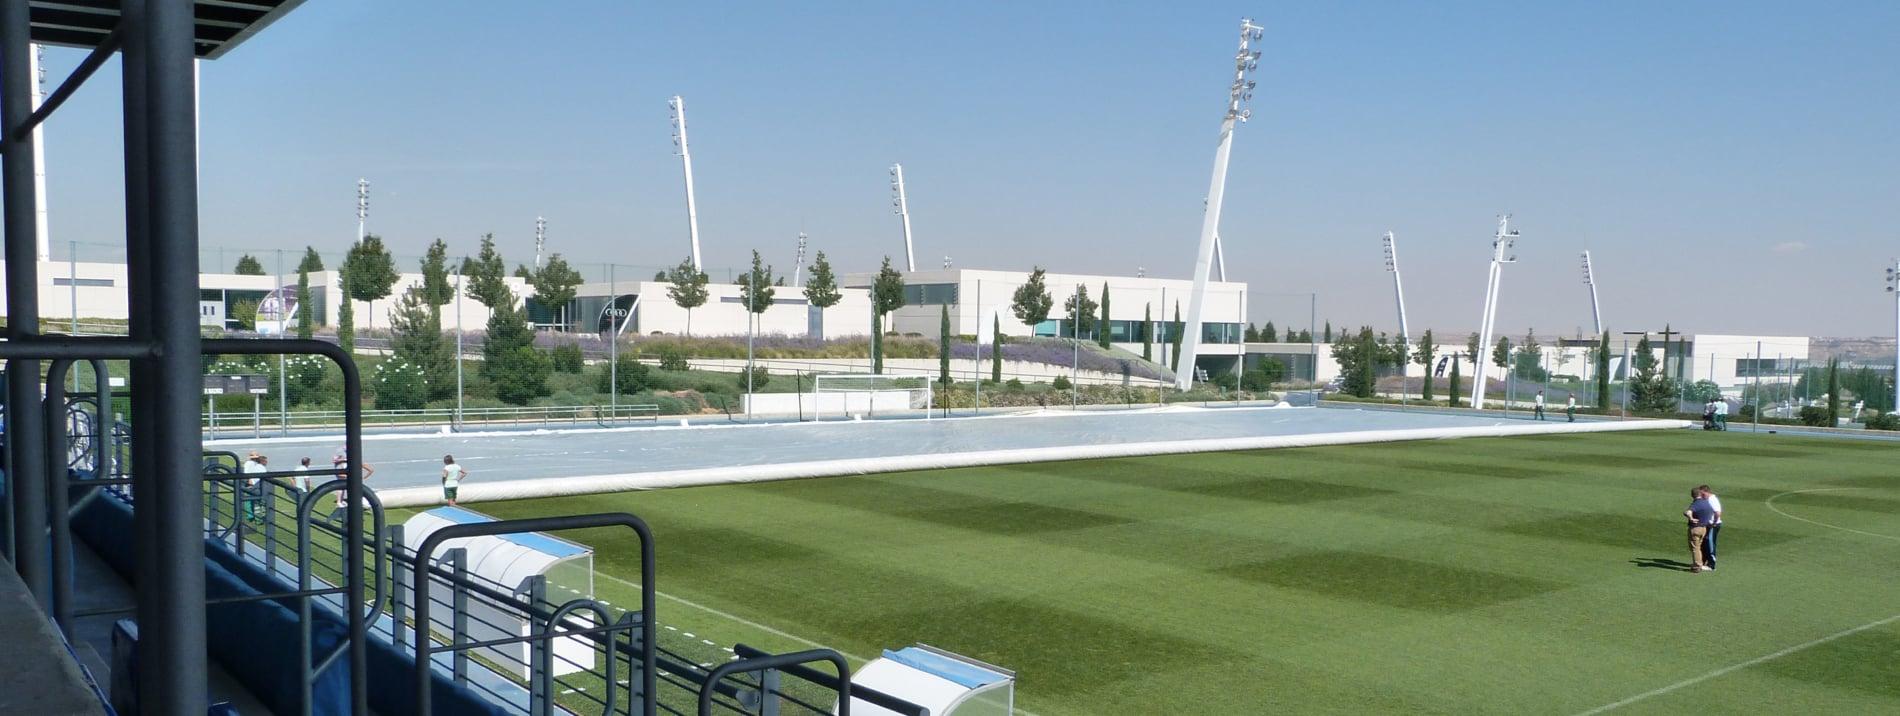 Matchsaver - Real Madrid Training Ground